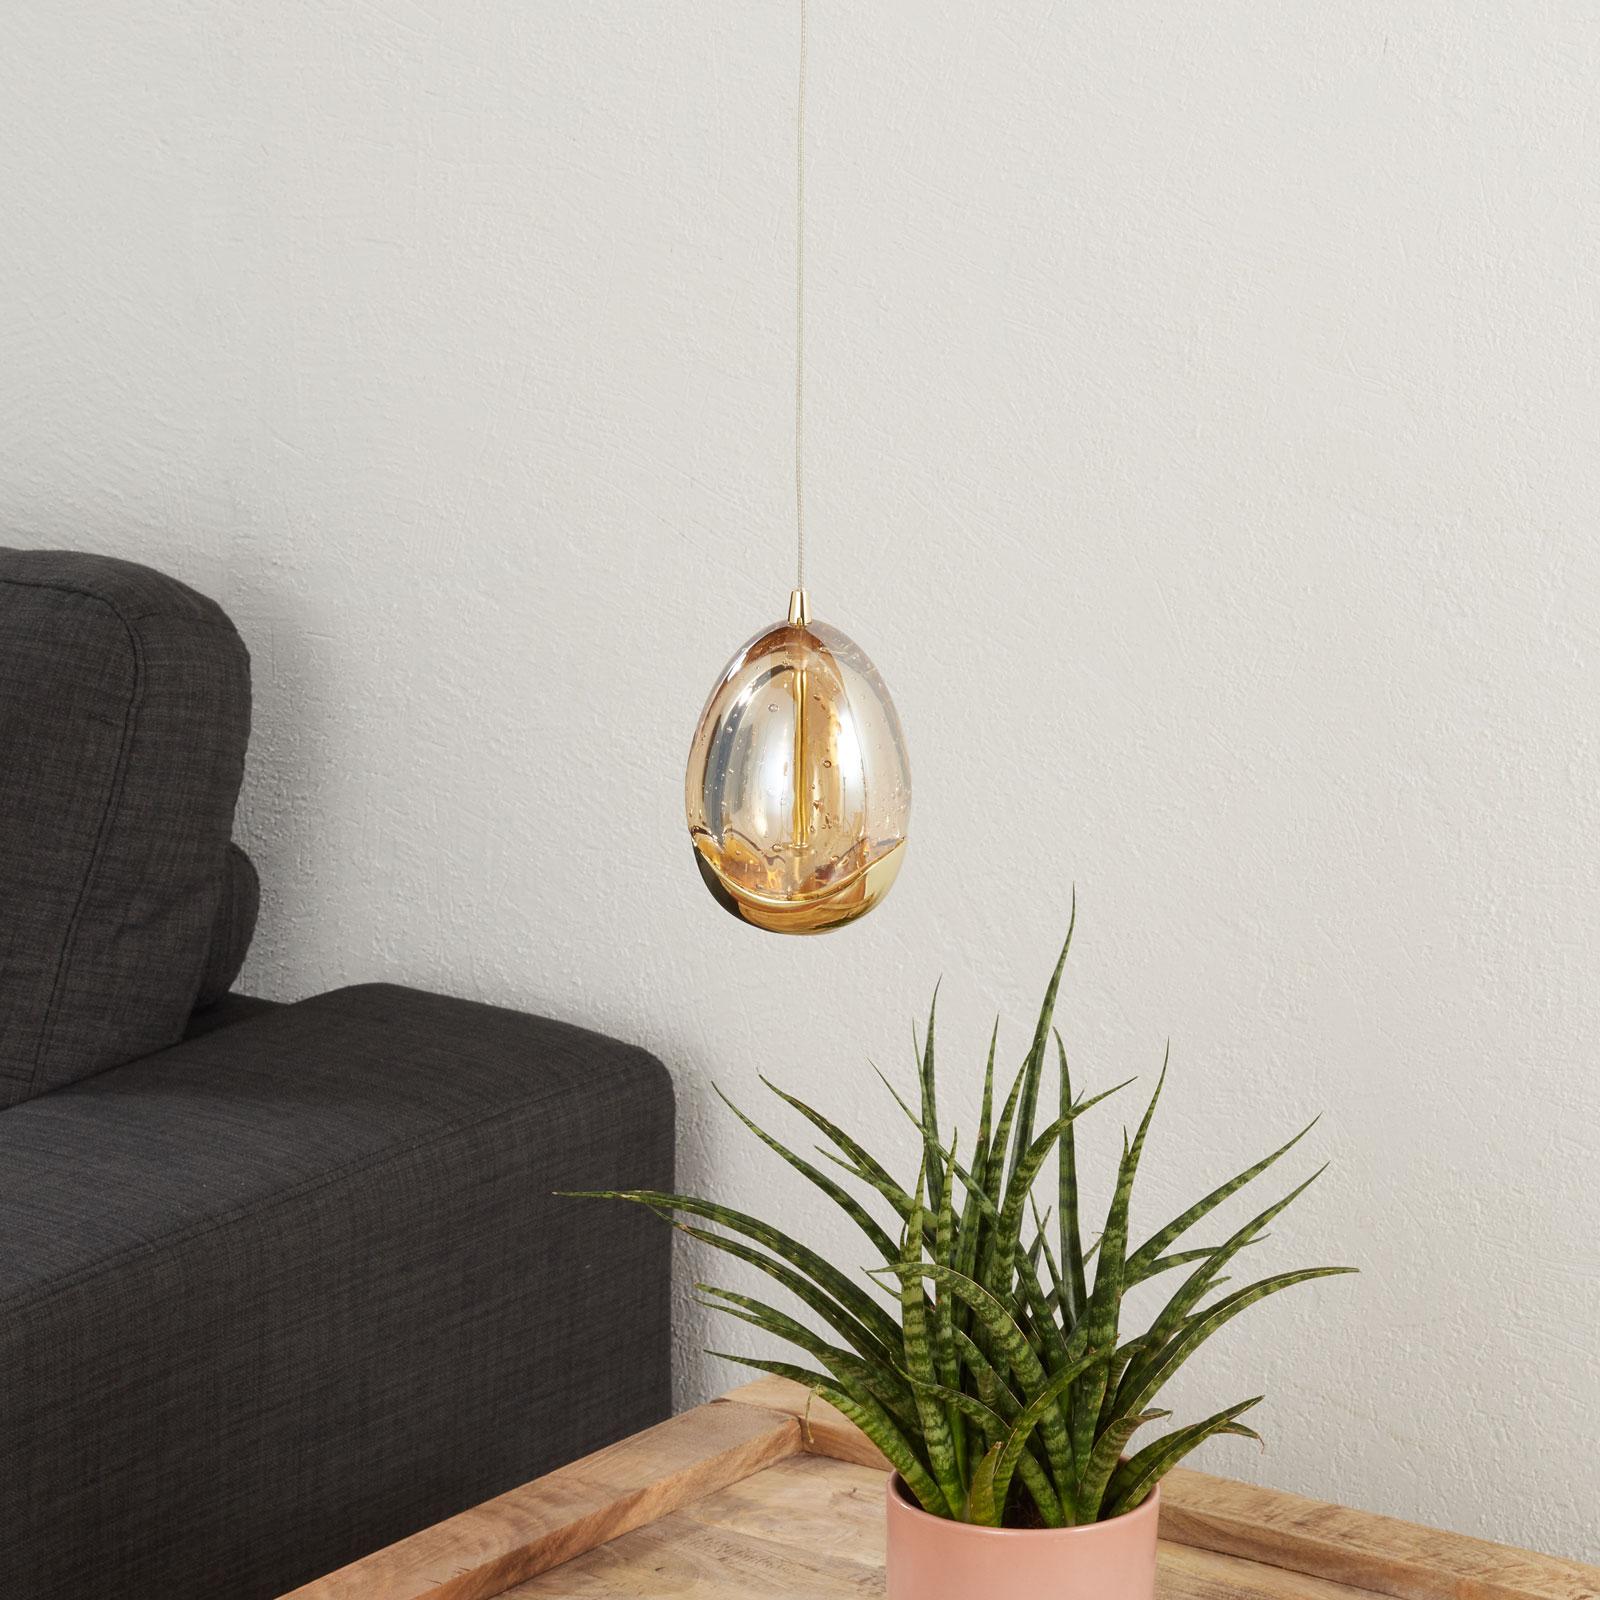 LED-Pendelleuchte Rocio 1-flammig mit Gold-Finish kaufen